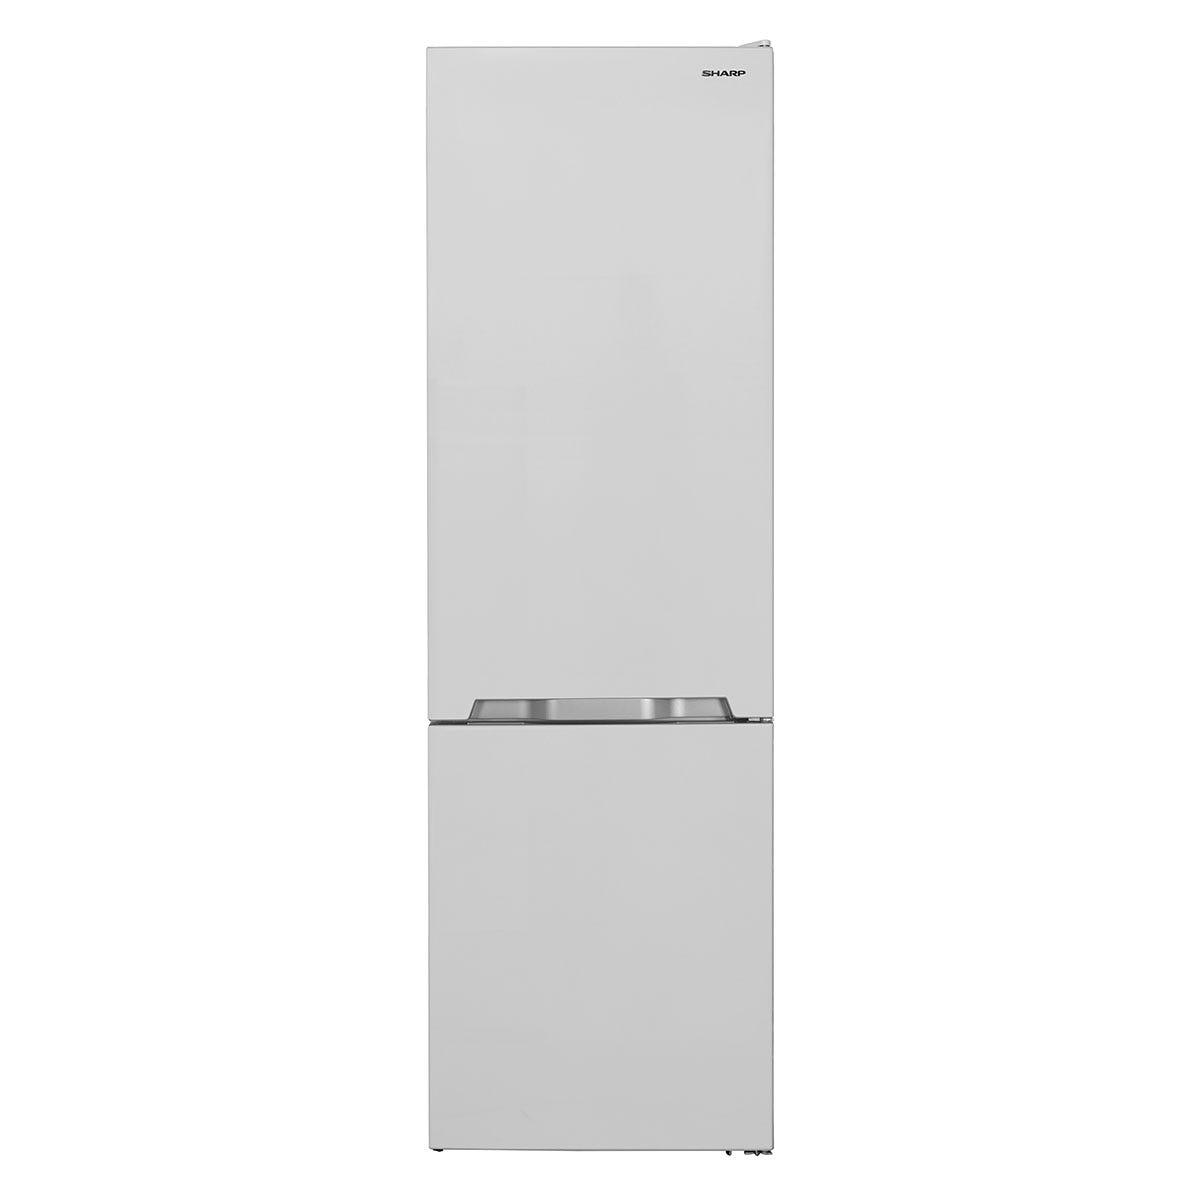 Sharp SJ-BB20IMXW1-EN FS 70/30 Combi Fridge Freezer with NanoFrost Technology - White